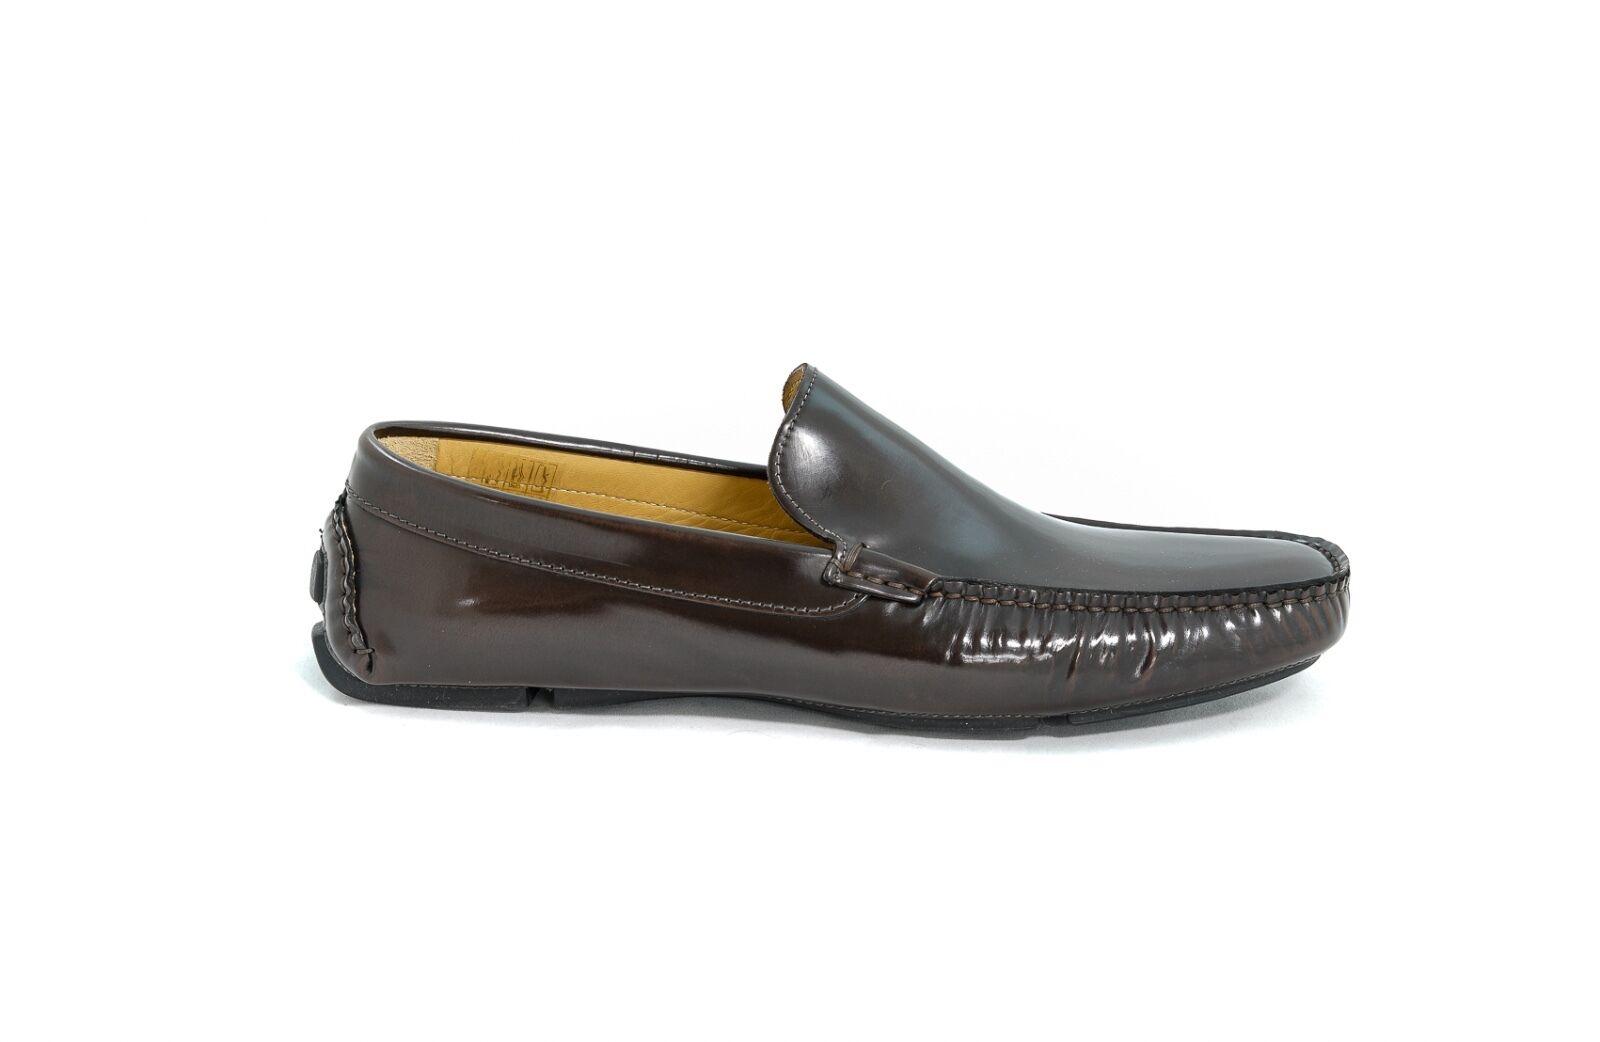 Romeo Gigli Milano Mens Dark Brown Leather Loafers New in Box - RG9015313